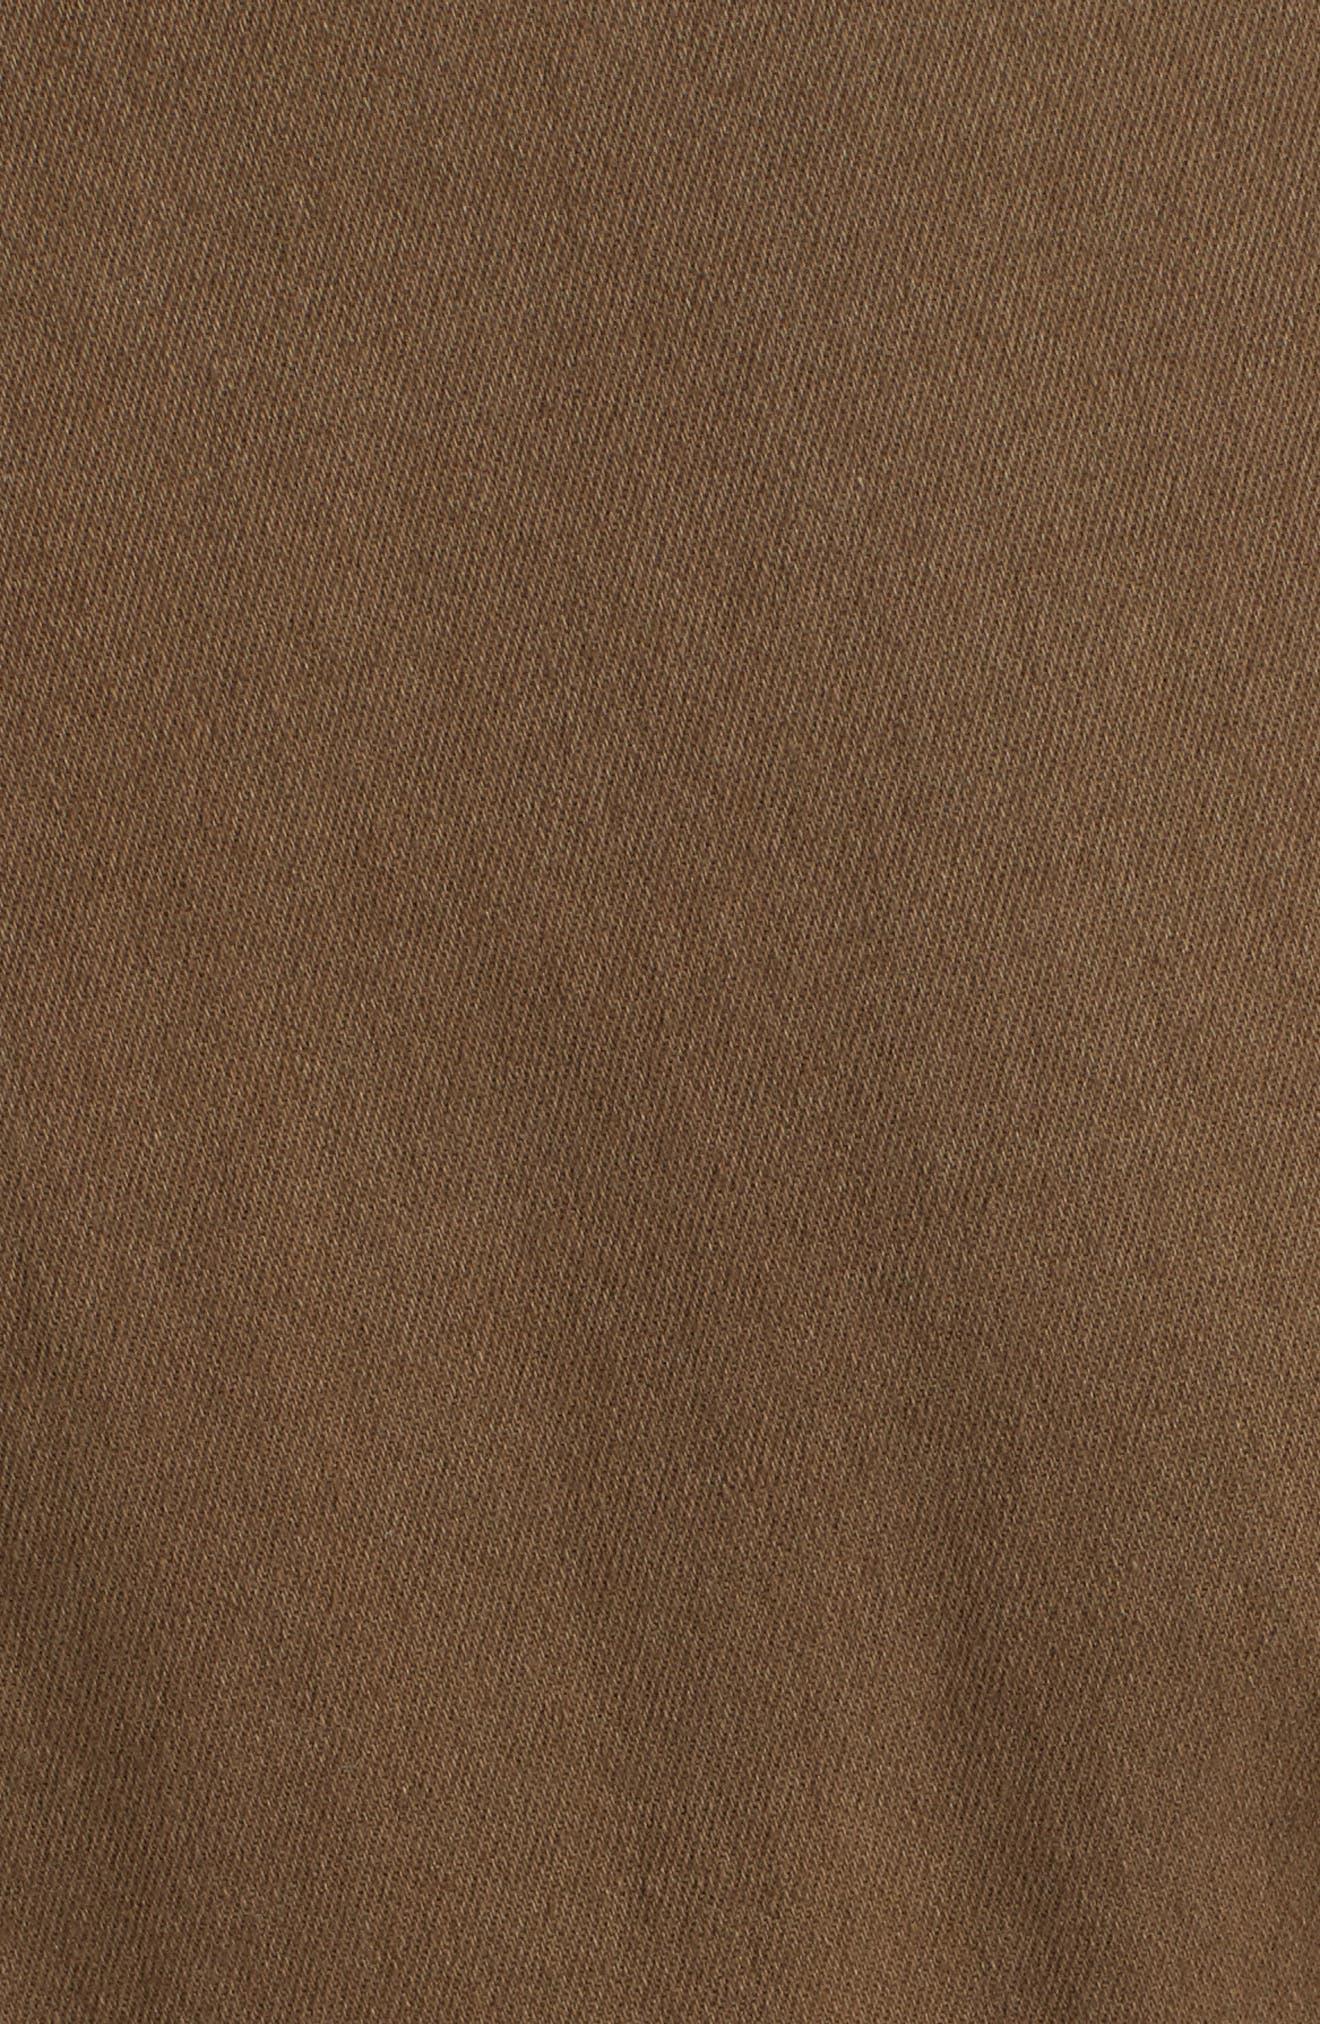 PROENZA SCHOULER, PSWL Stretch Twill Utility Jumpsuit, Alternate thumbnail 6, color, DARK FATIGUE